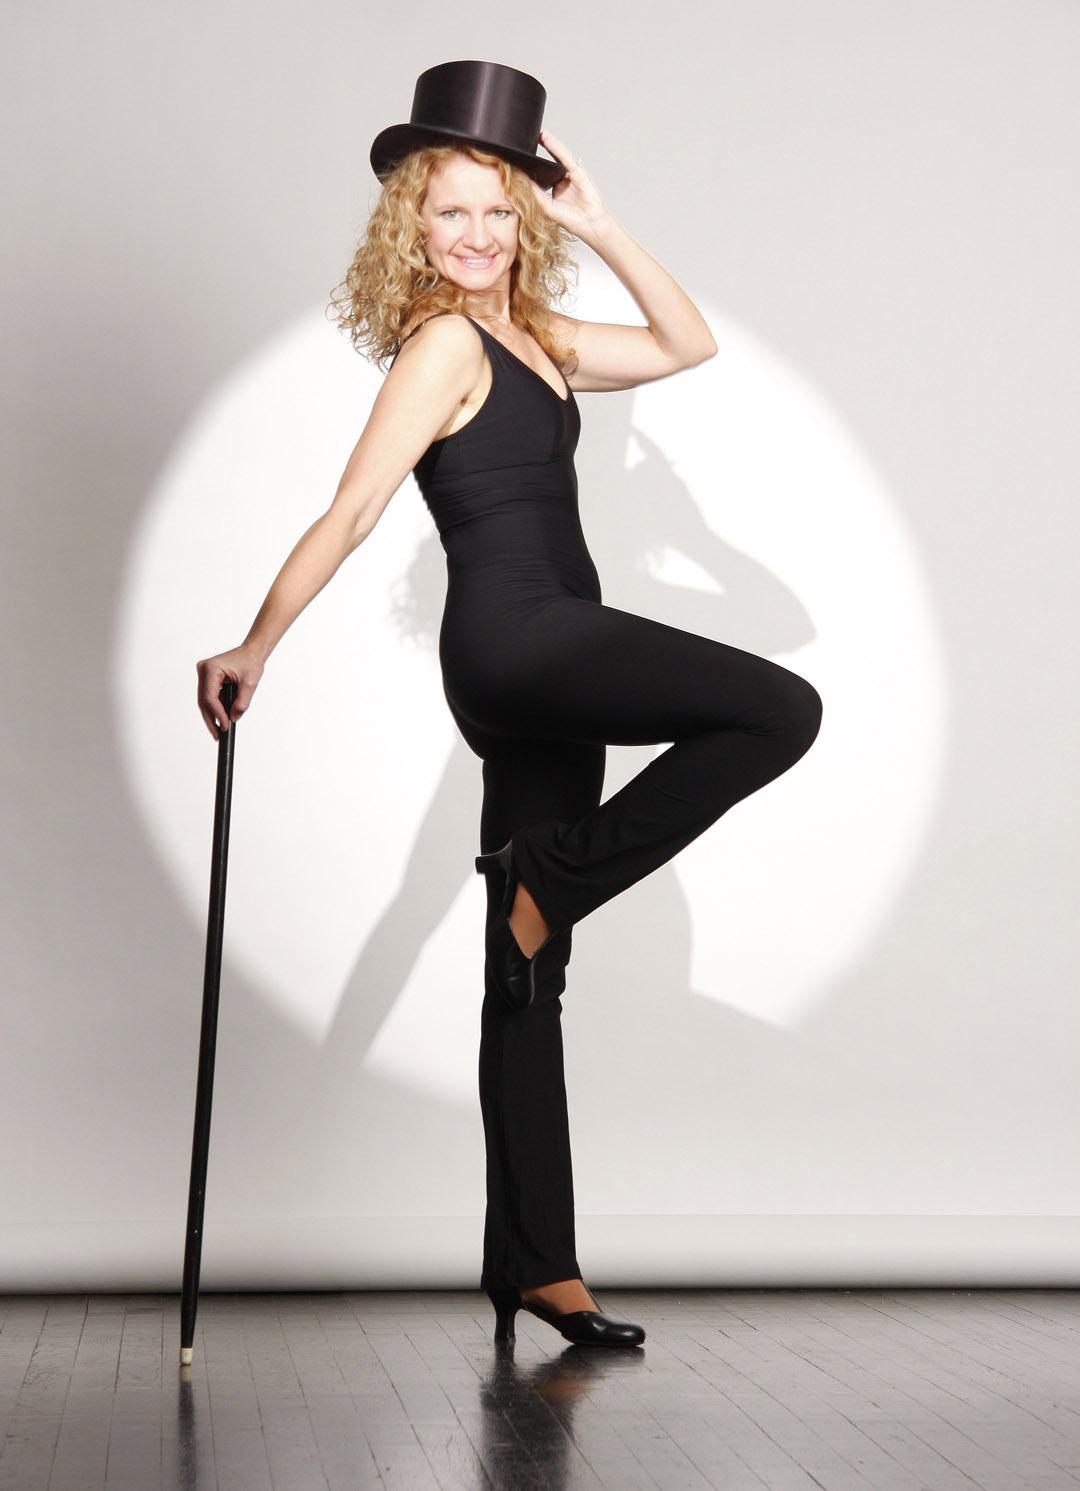 NYC Dancer Photos